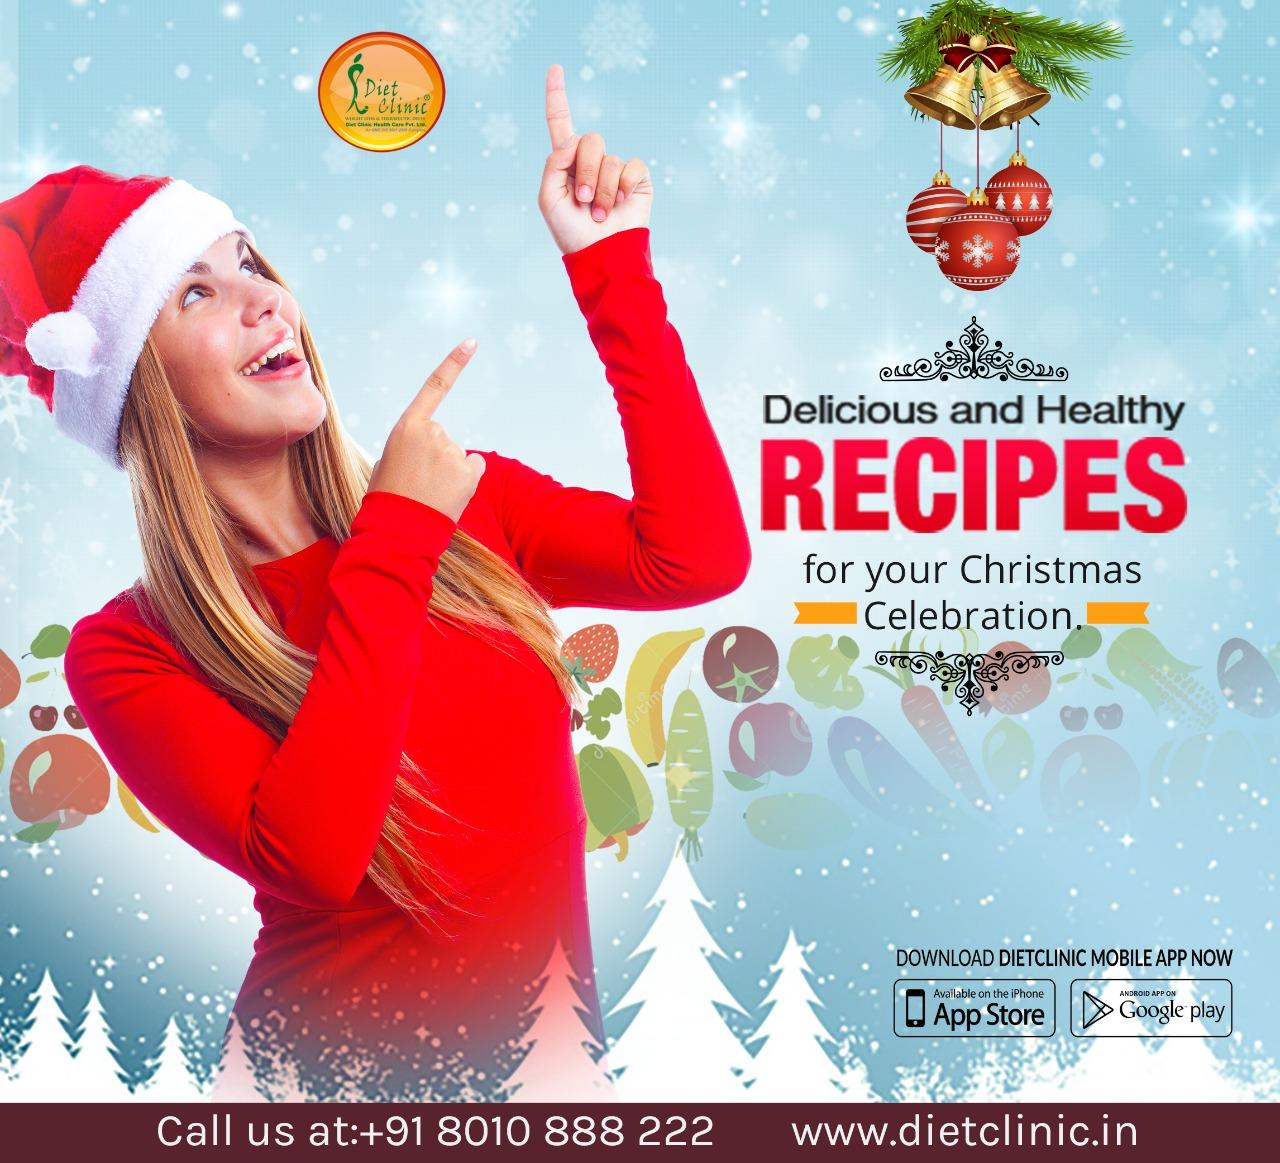 7 tips for a healthy festive season